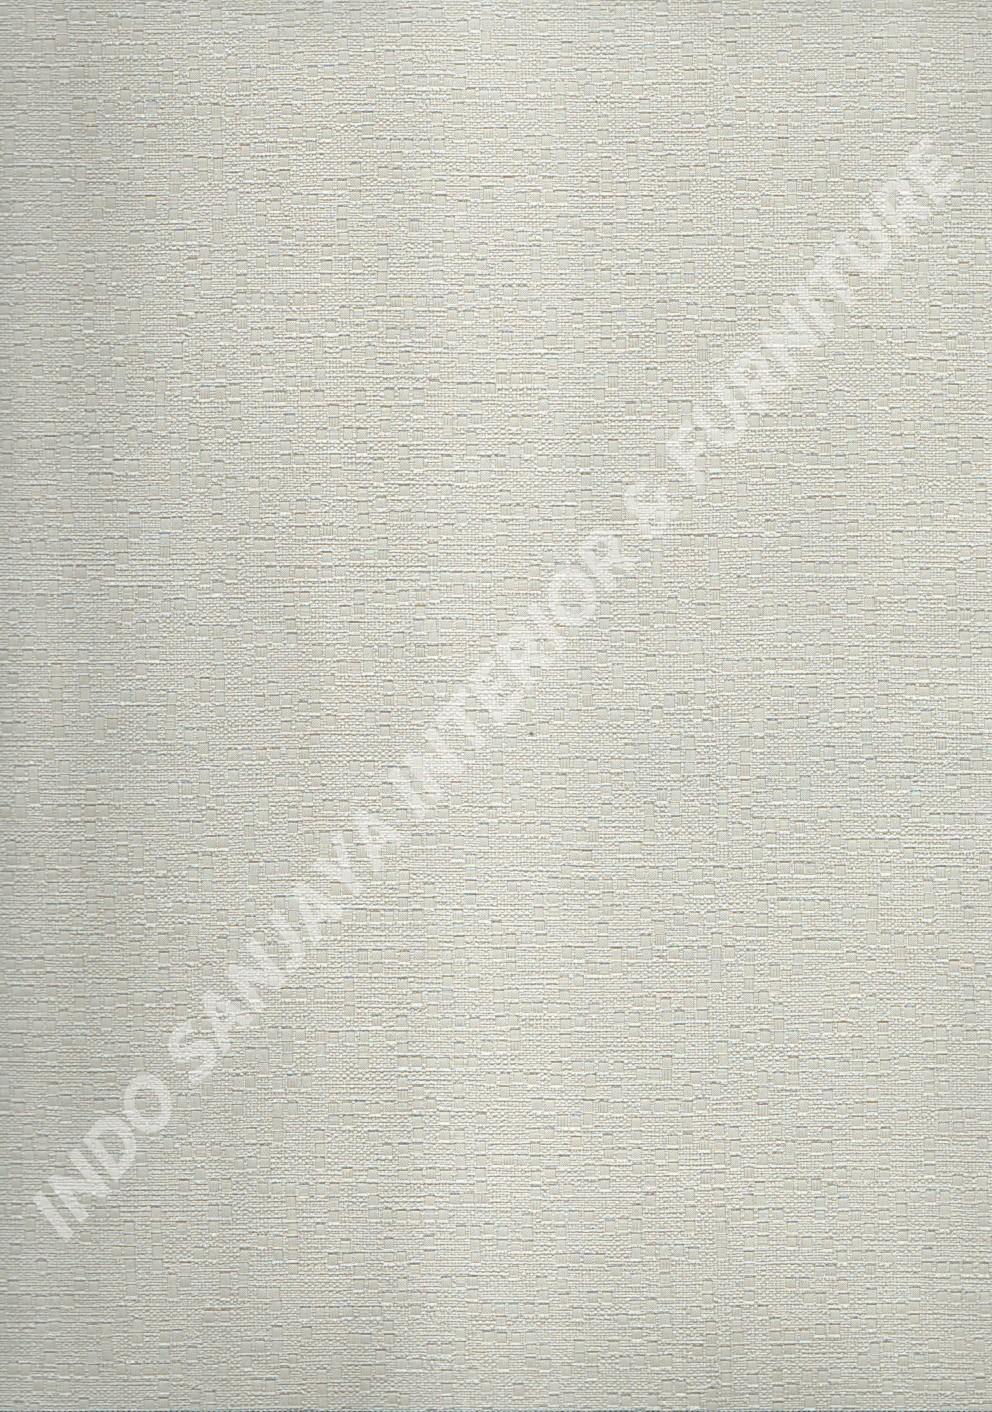 wallpaper   Wallpaper Minimalis Polos 3064:3064 corak  warna